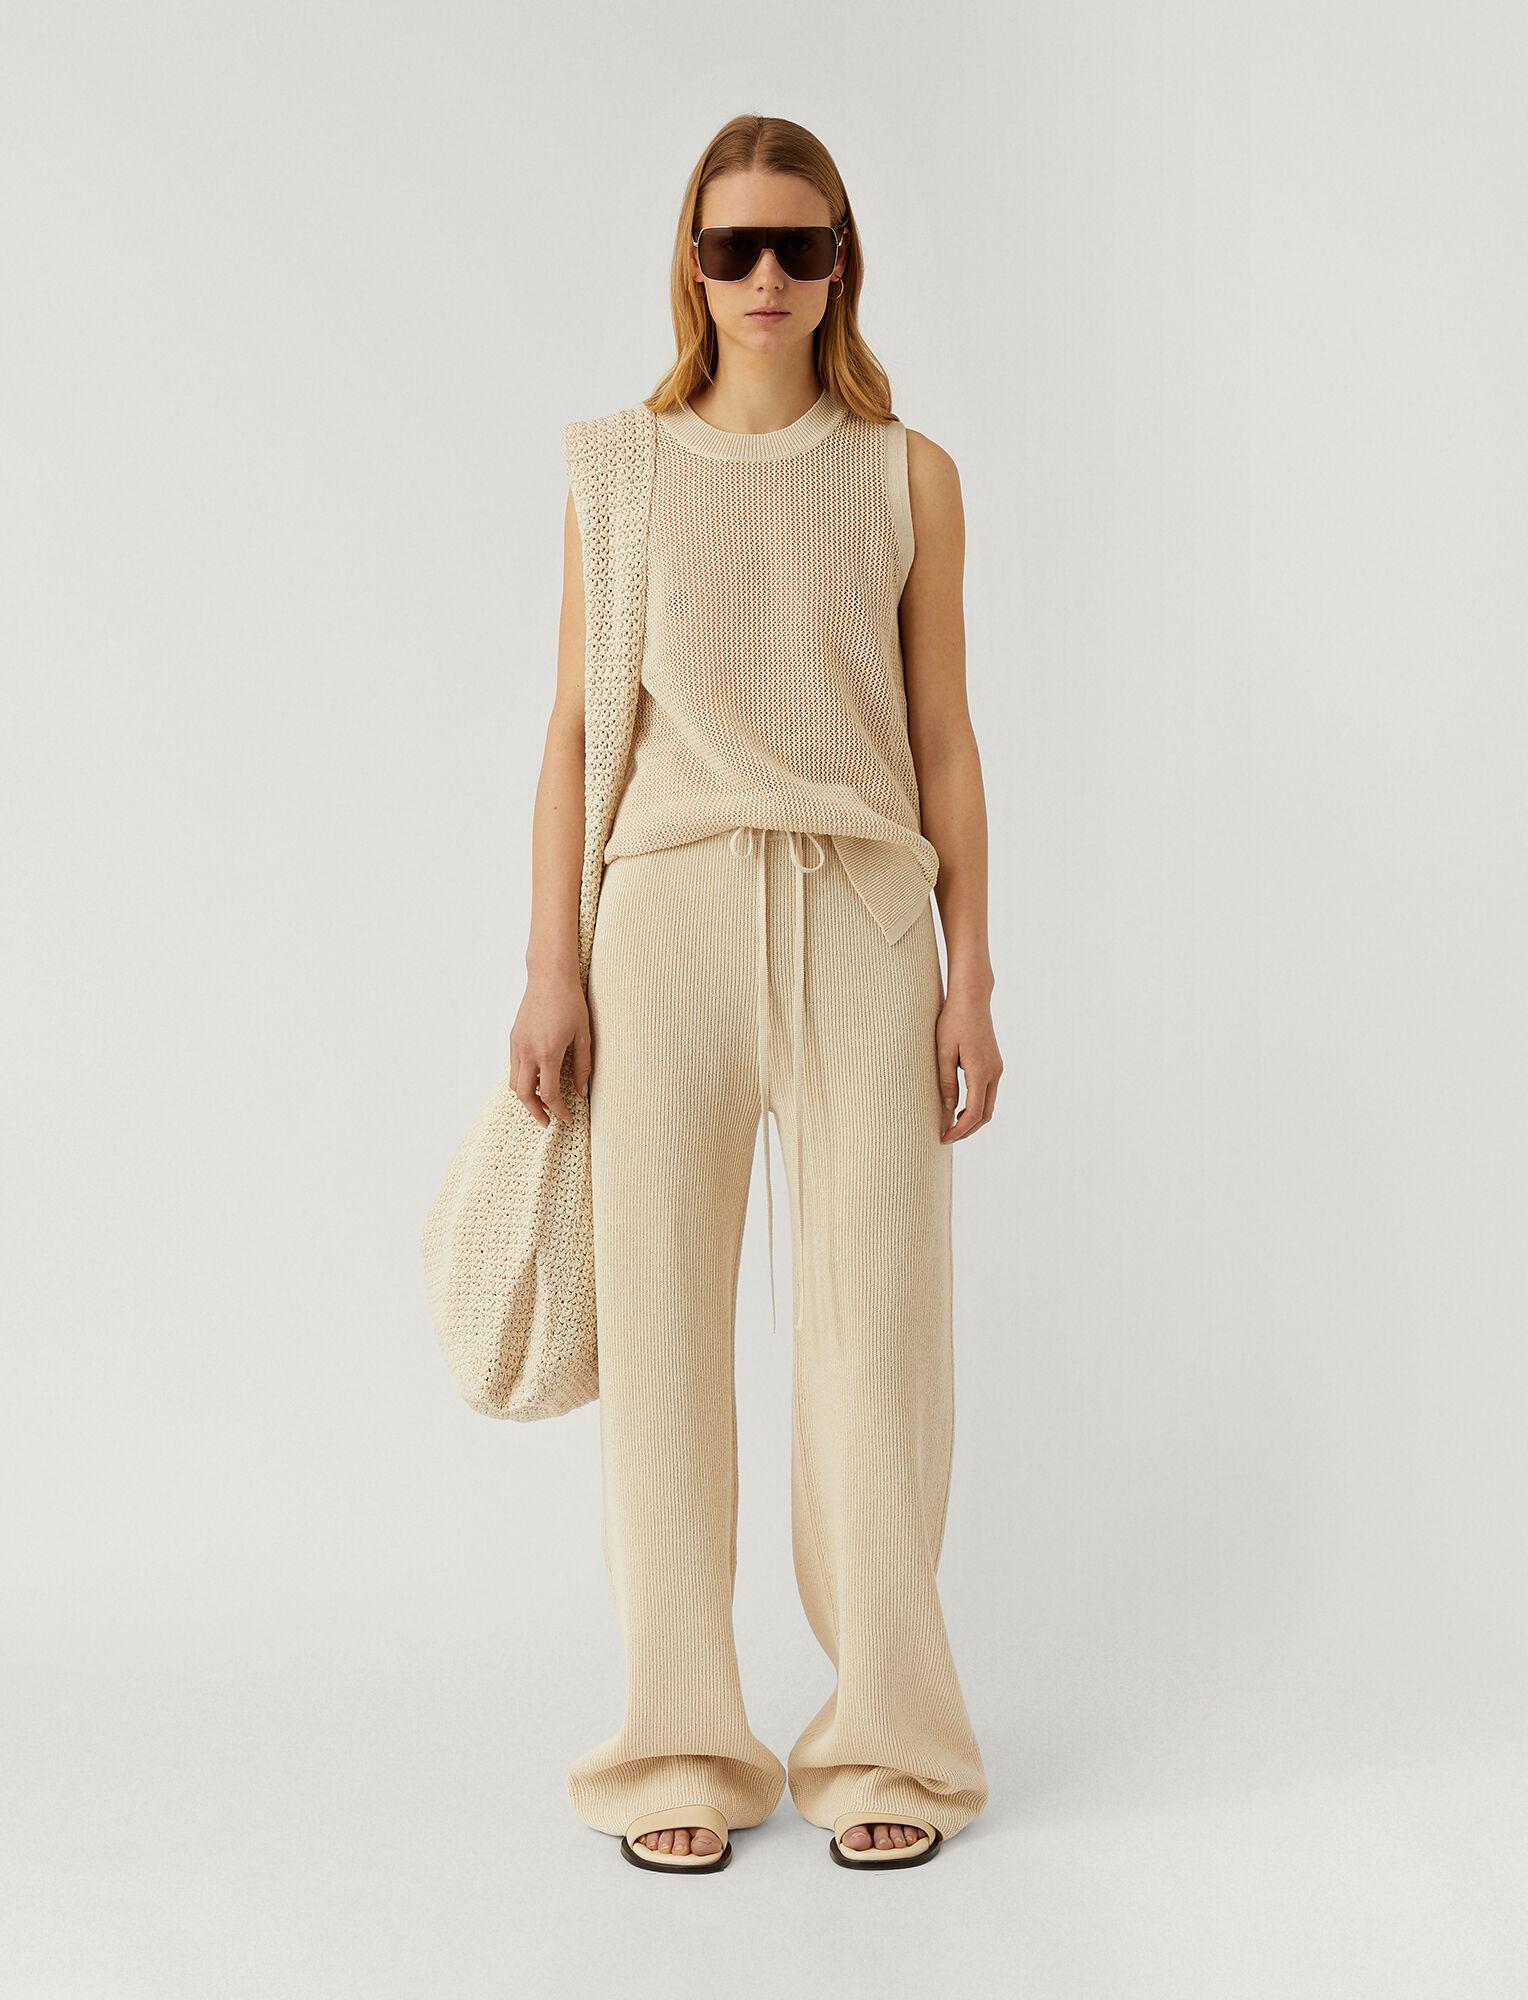 Joseph, Crispy Cotton Trousers, in PORCELAIN